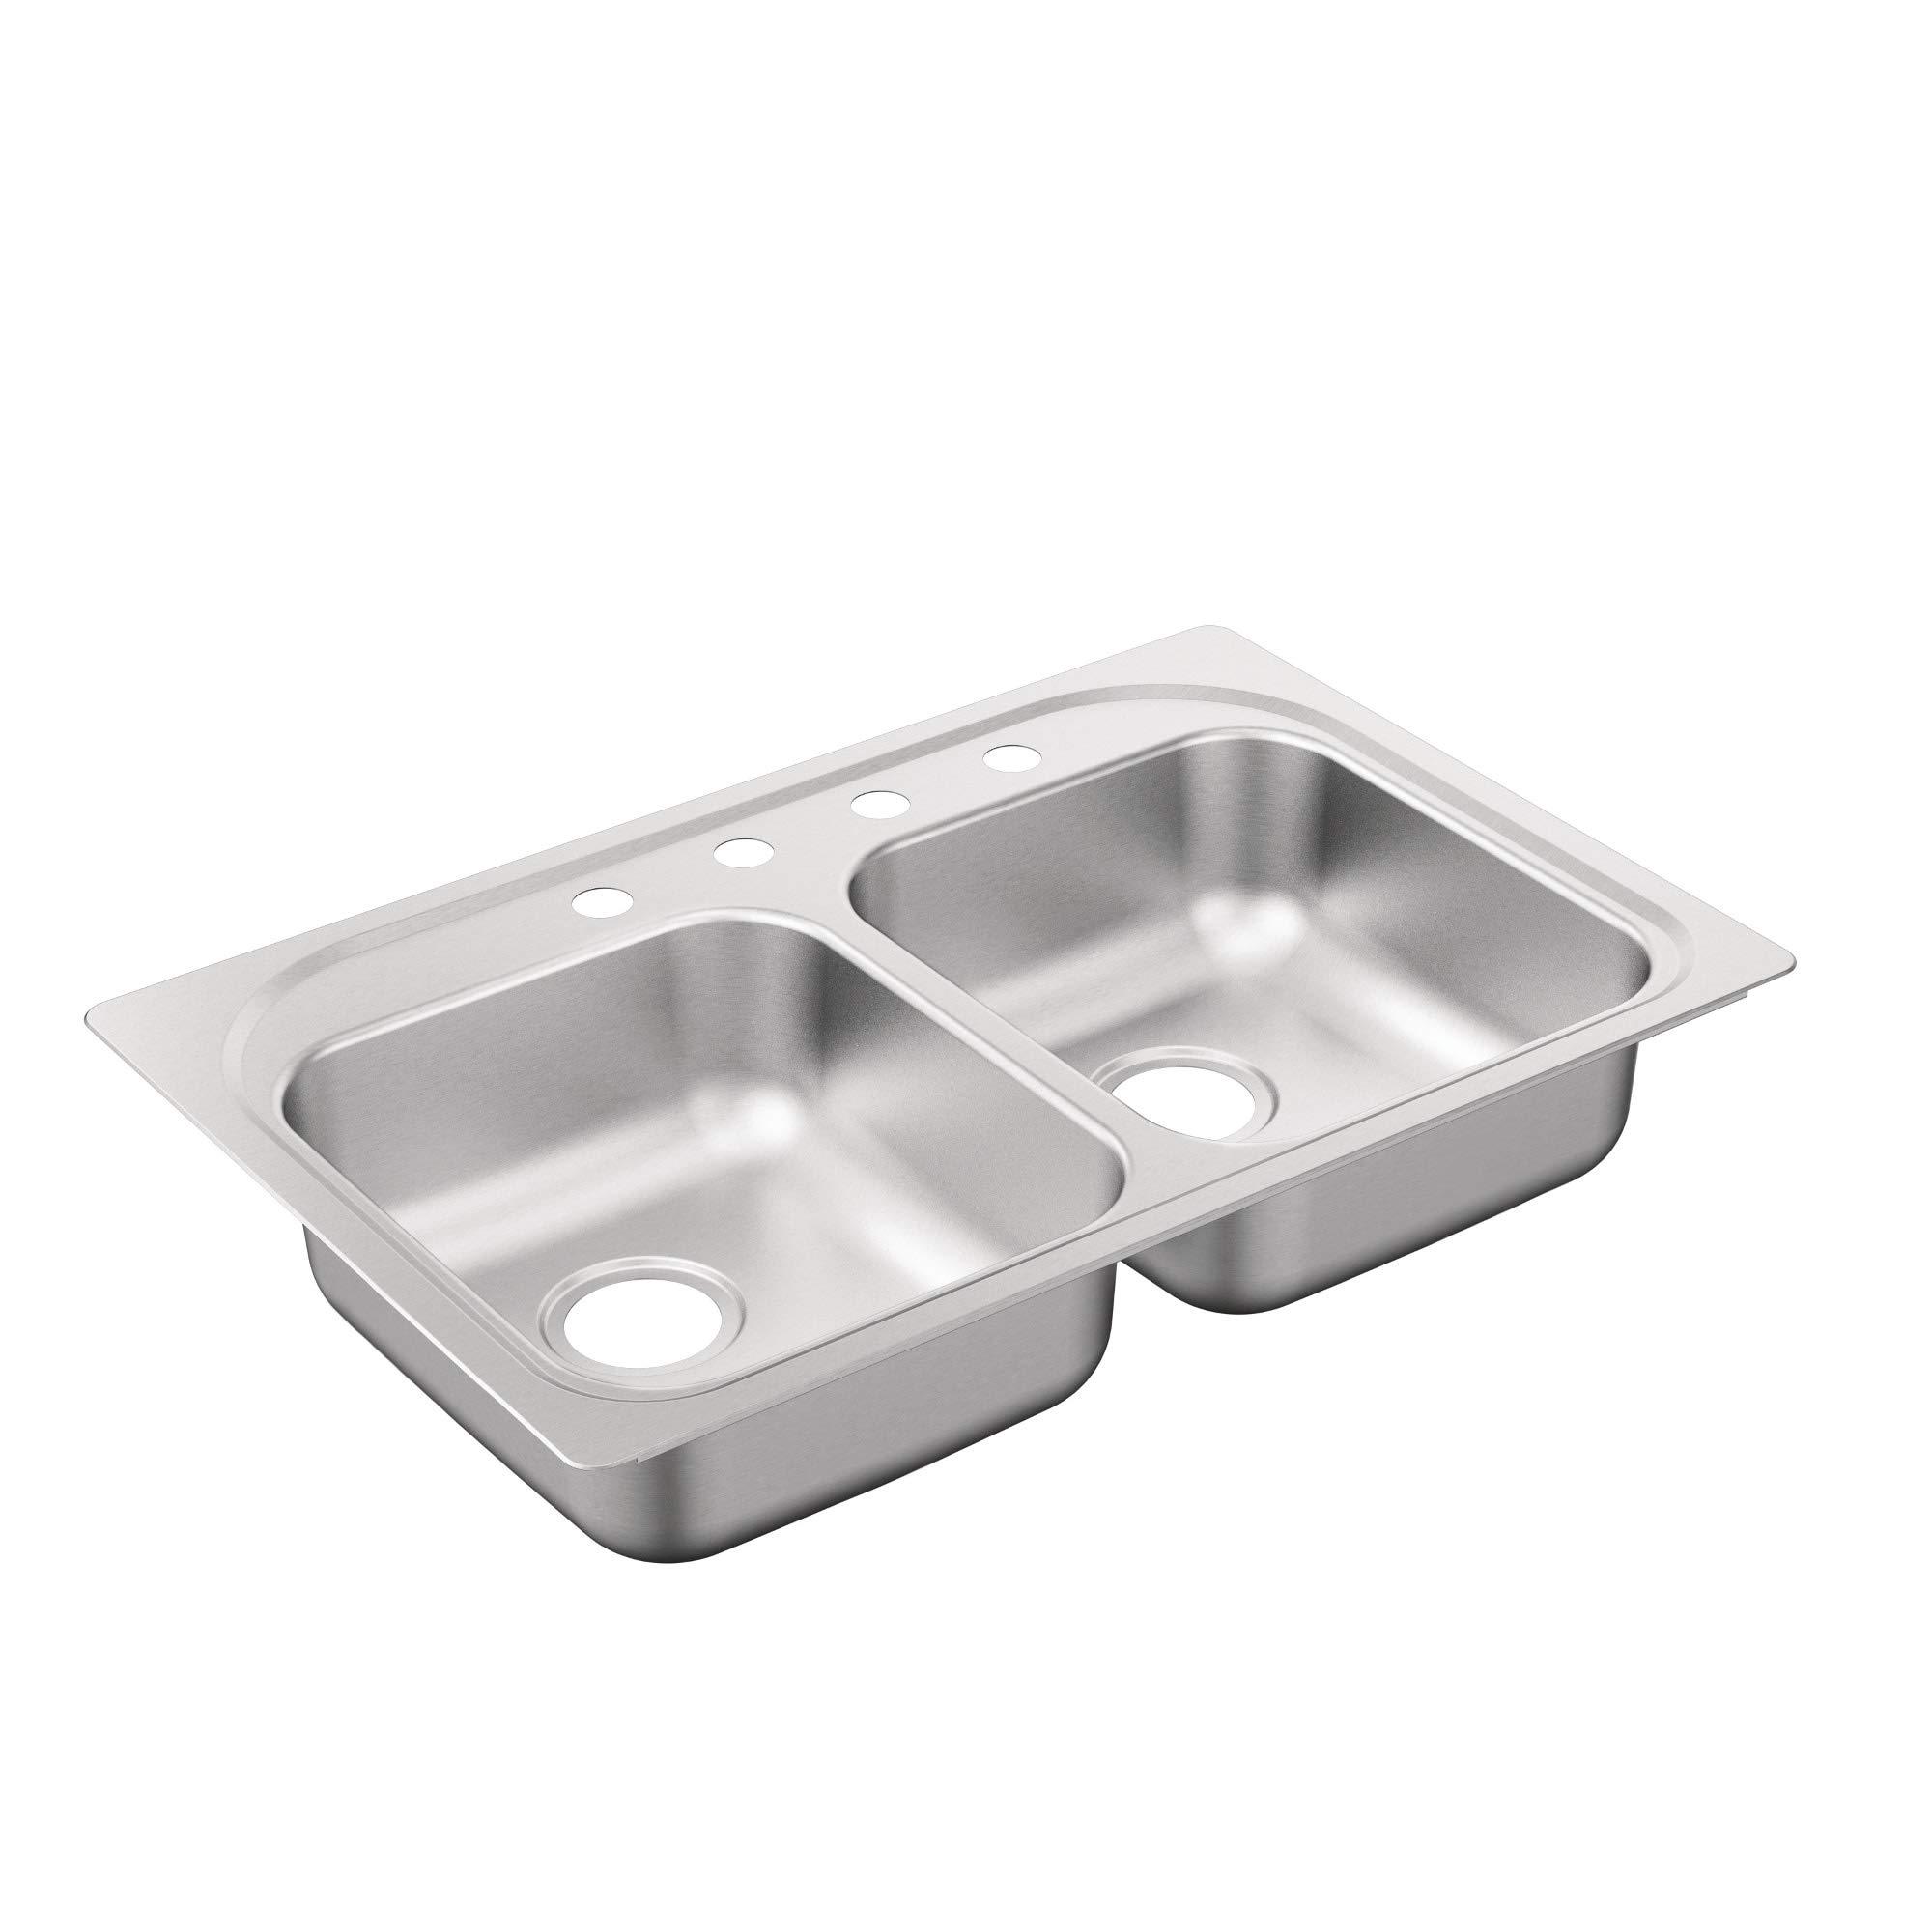 Moen G222164B 2200 Series Sink, Brushed/Satin Stainless by Moen